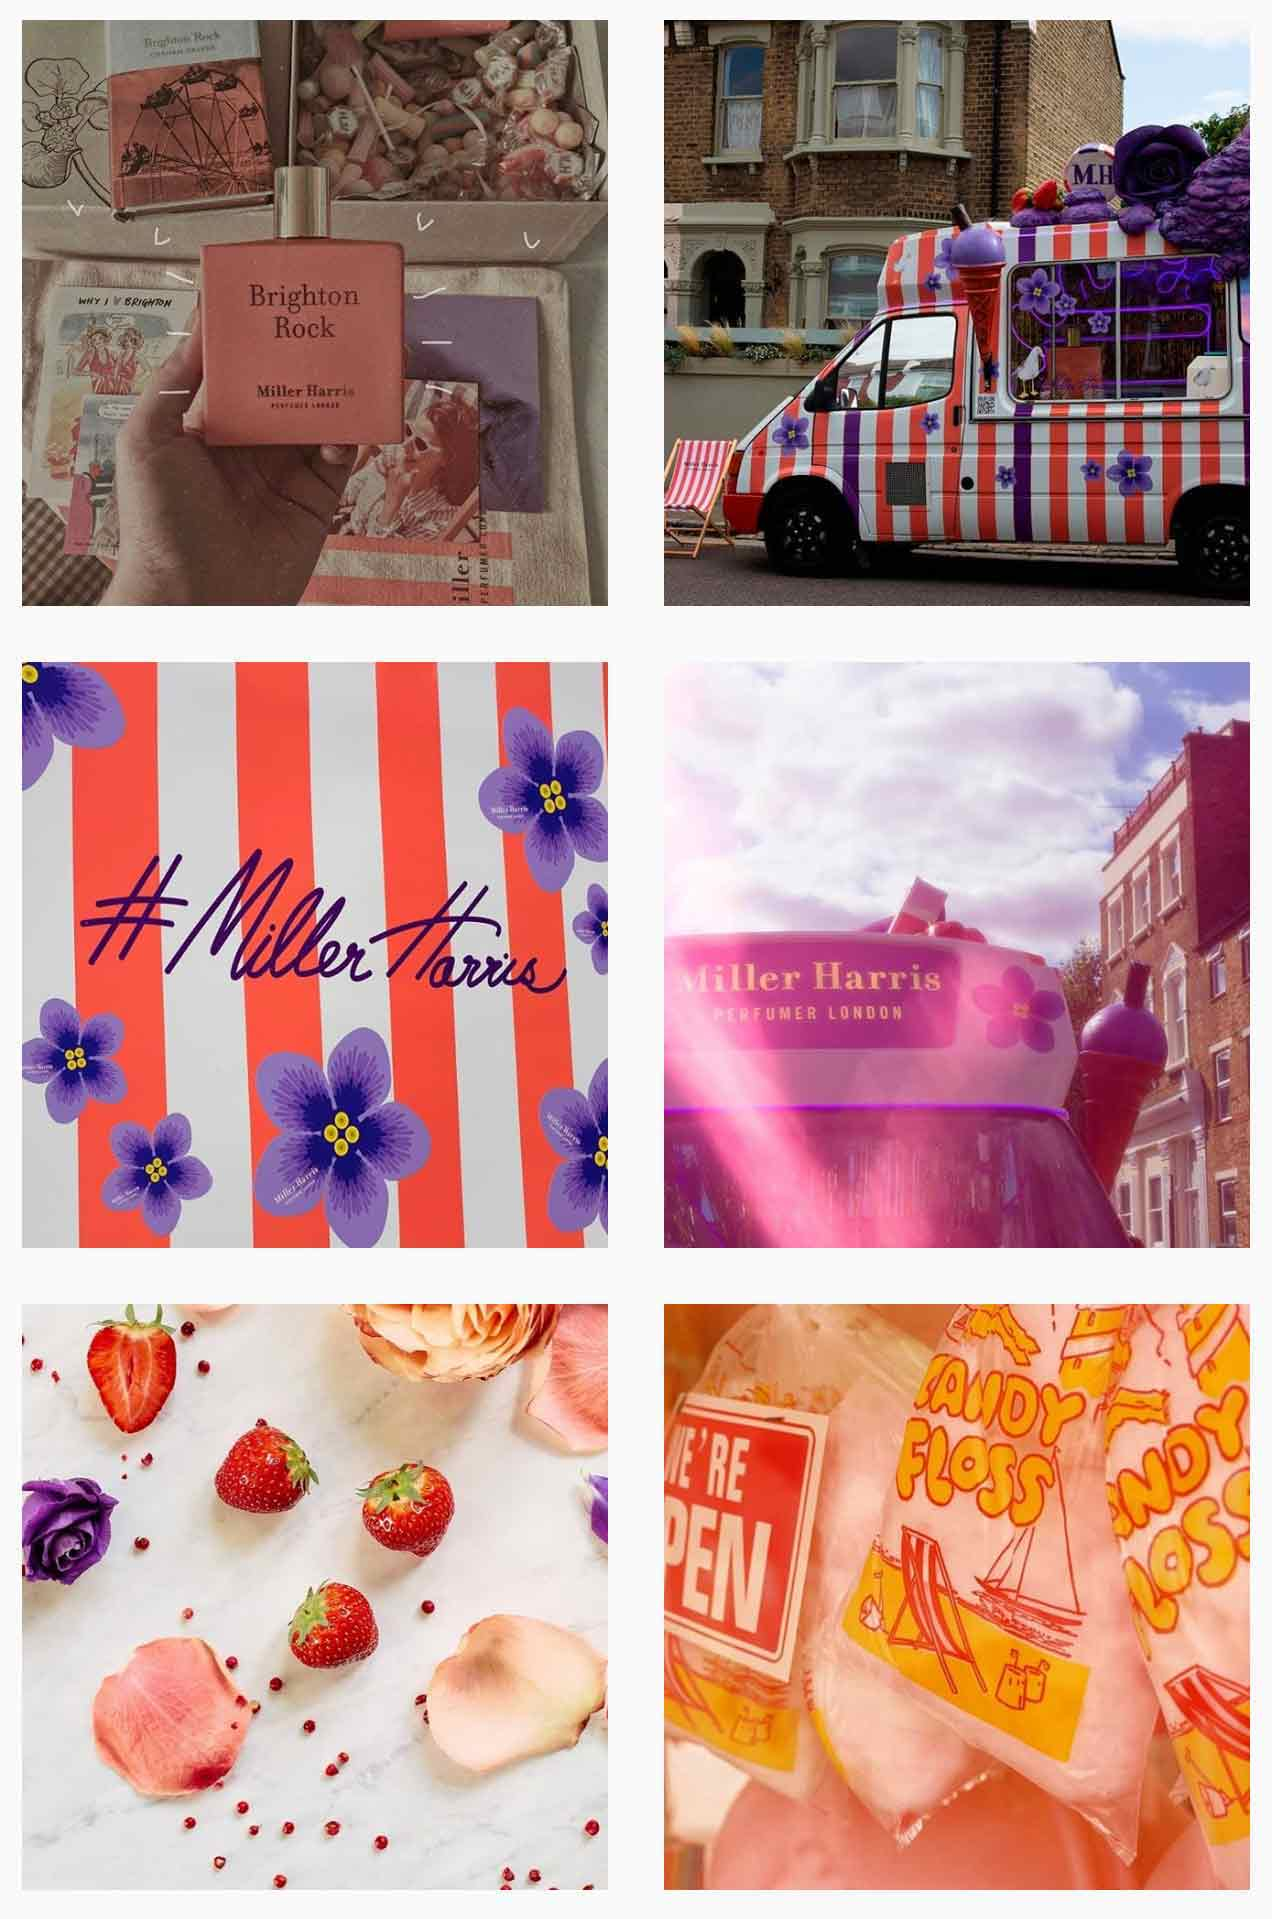 Miller Harris, London Perfumer, UK Luxury Perfume Shop & Online